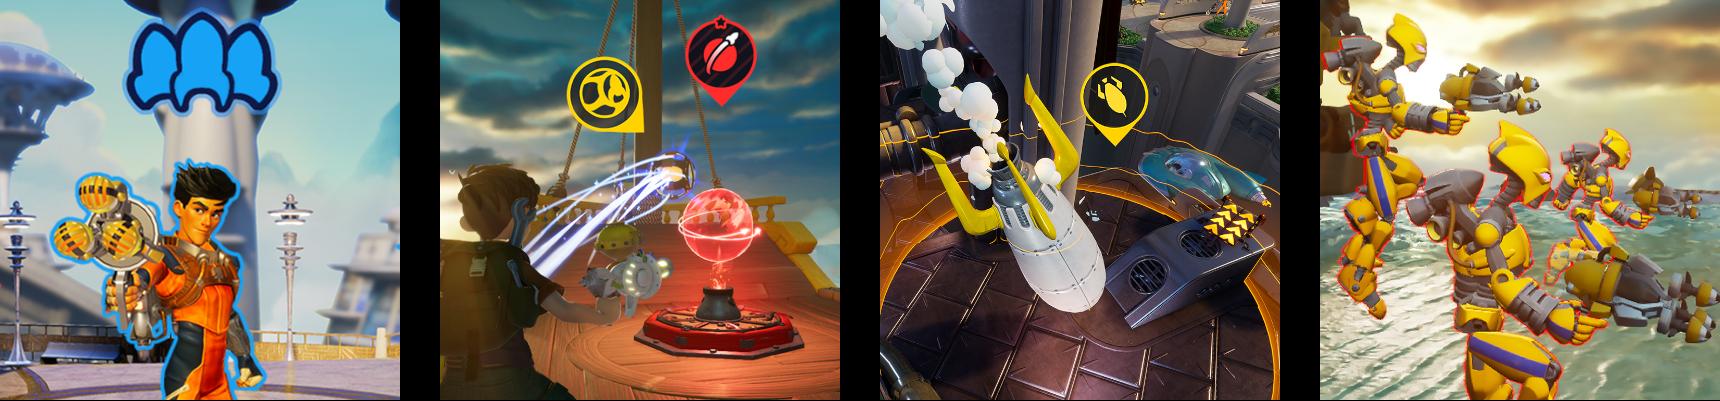 Electronic Arts, Final Strike Games, Rocket Arena